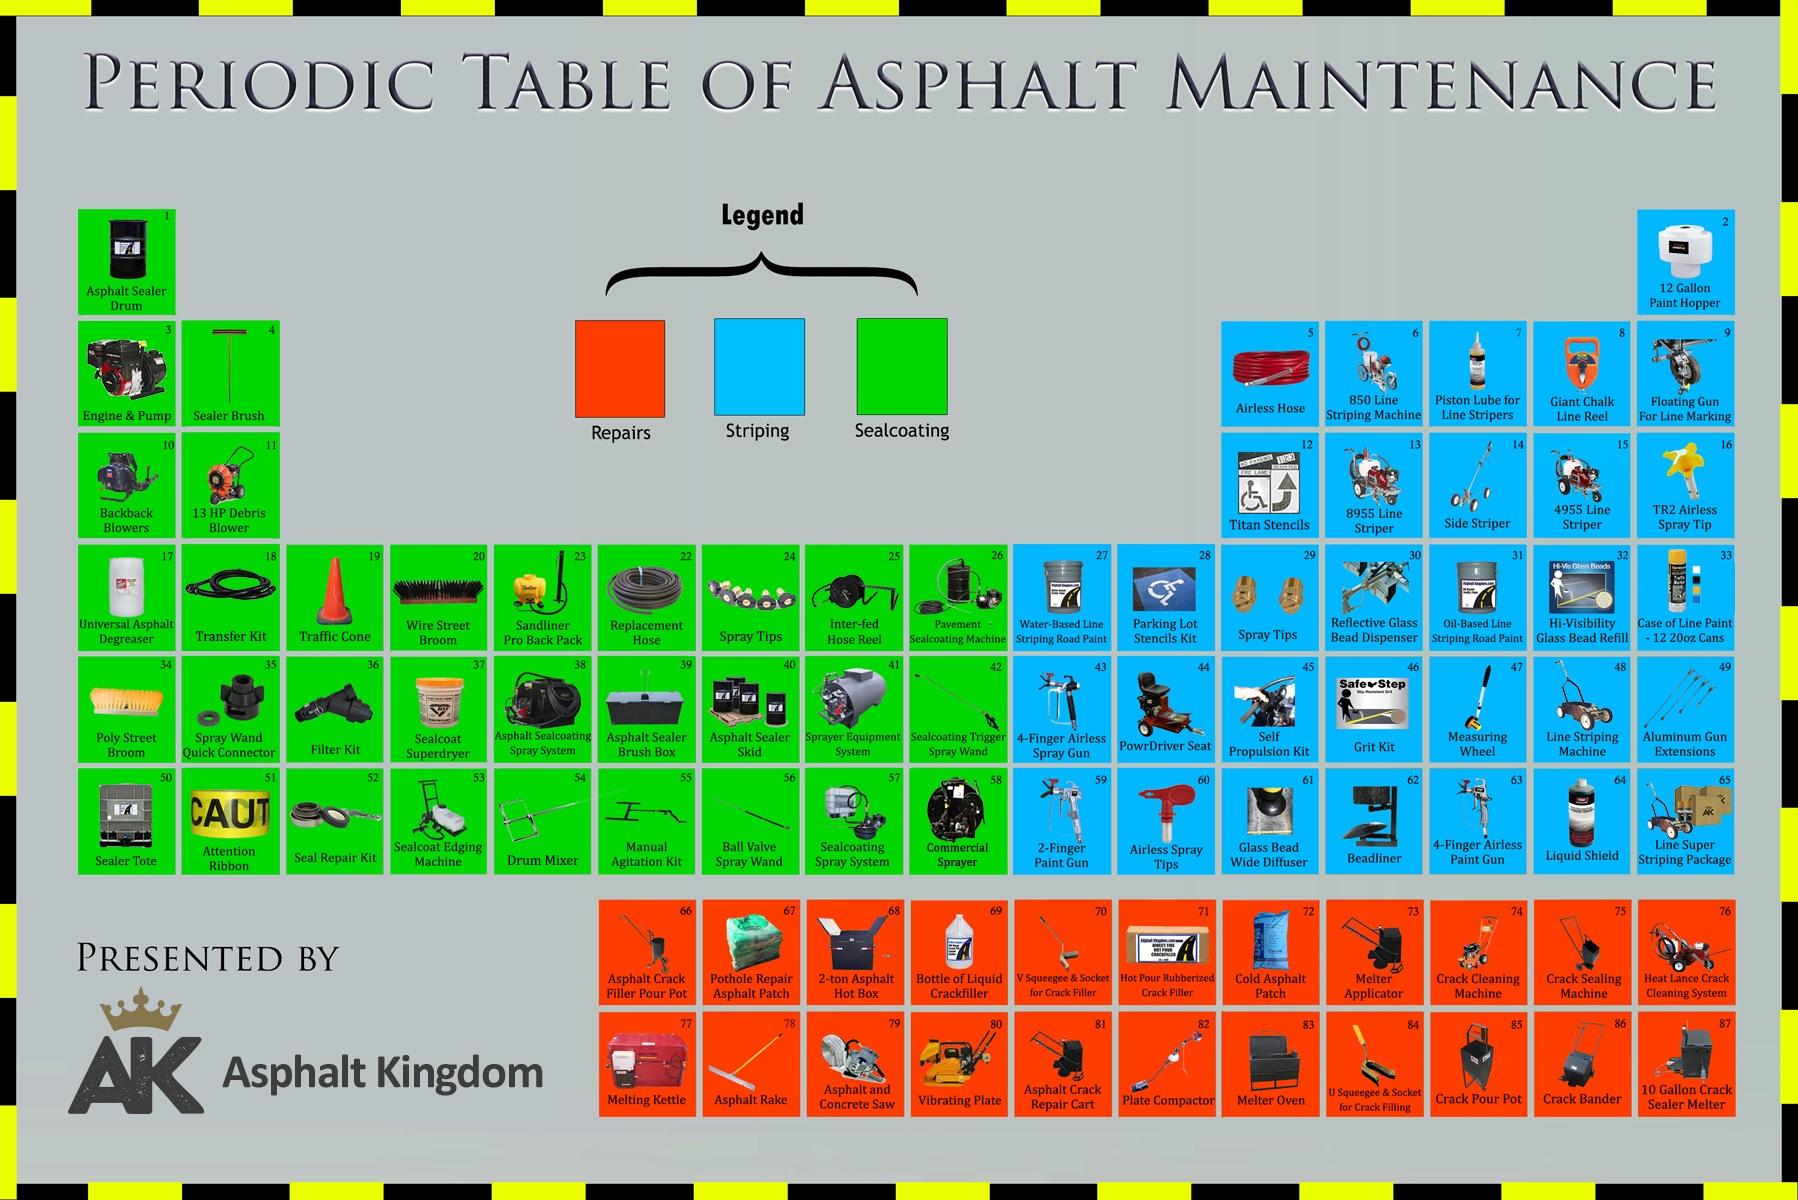 Periodic Table of Asphalt Maintenance